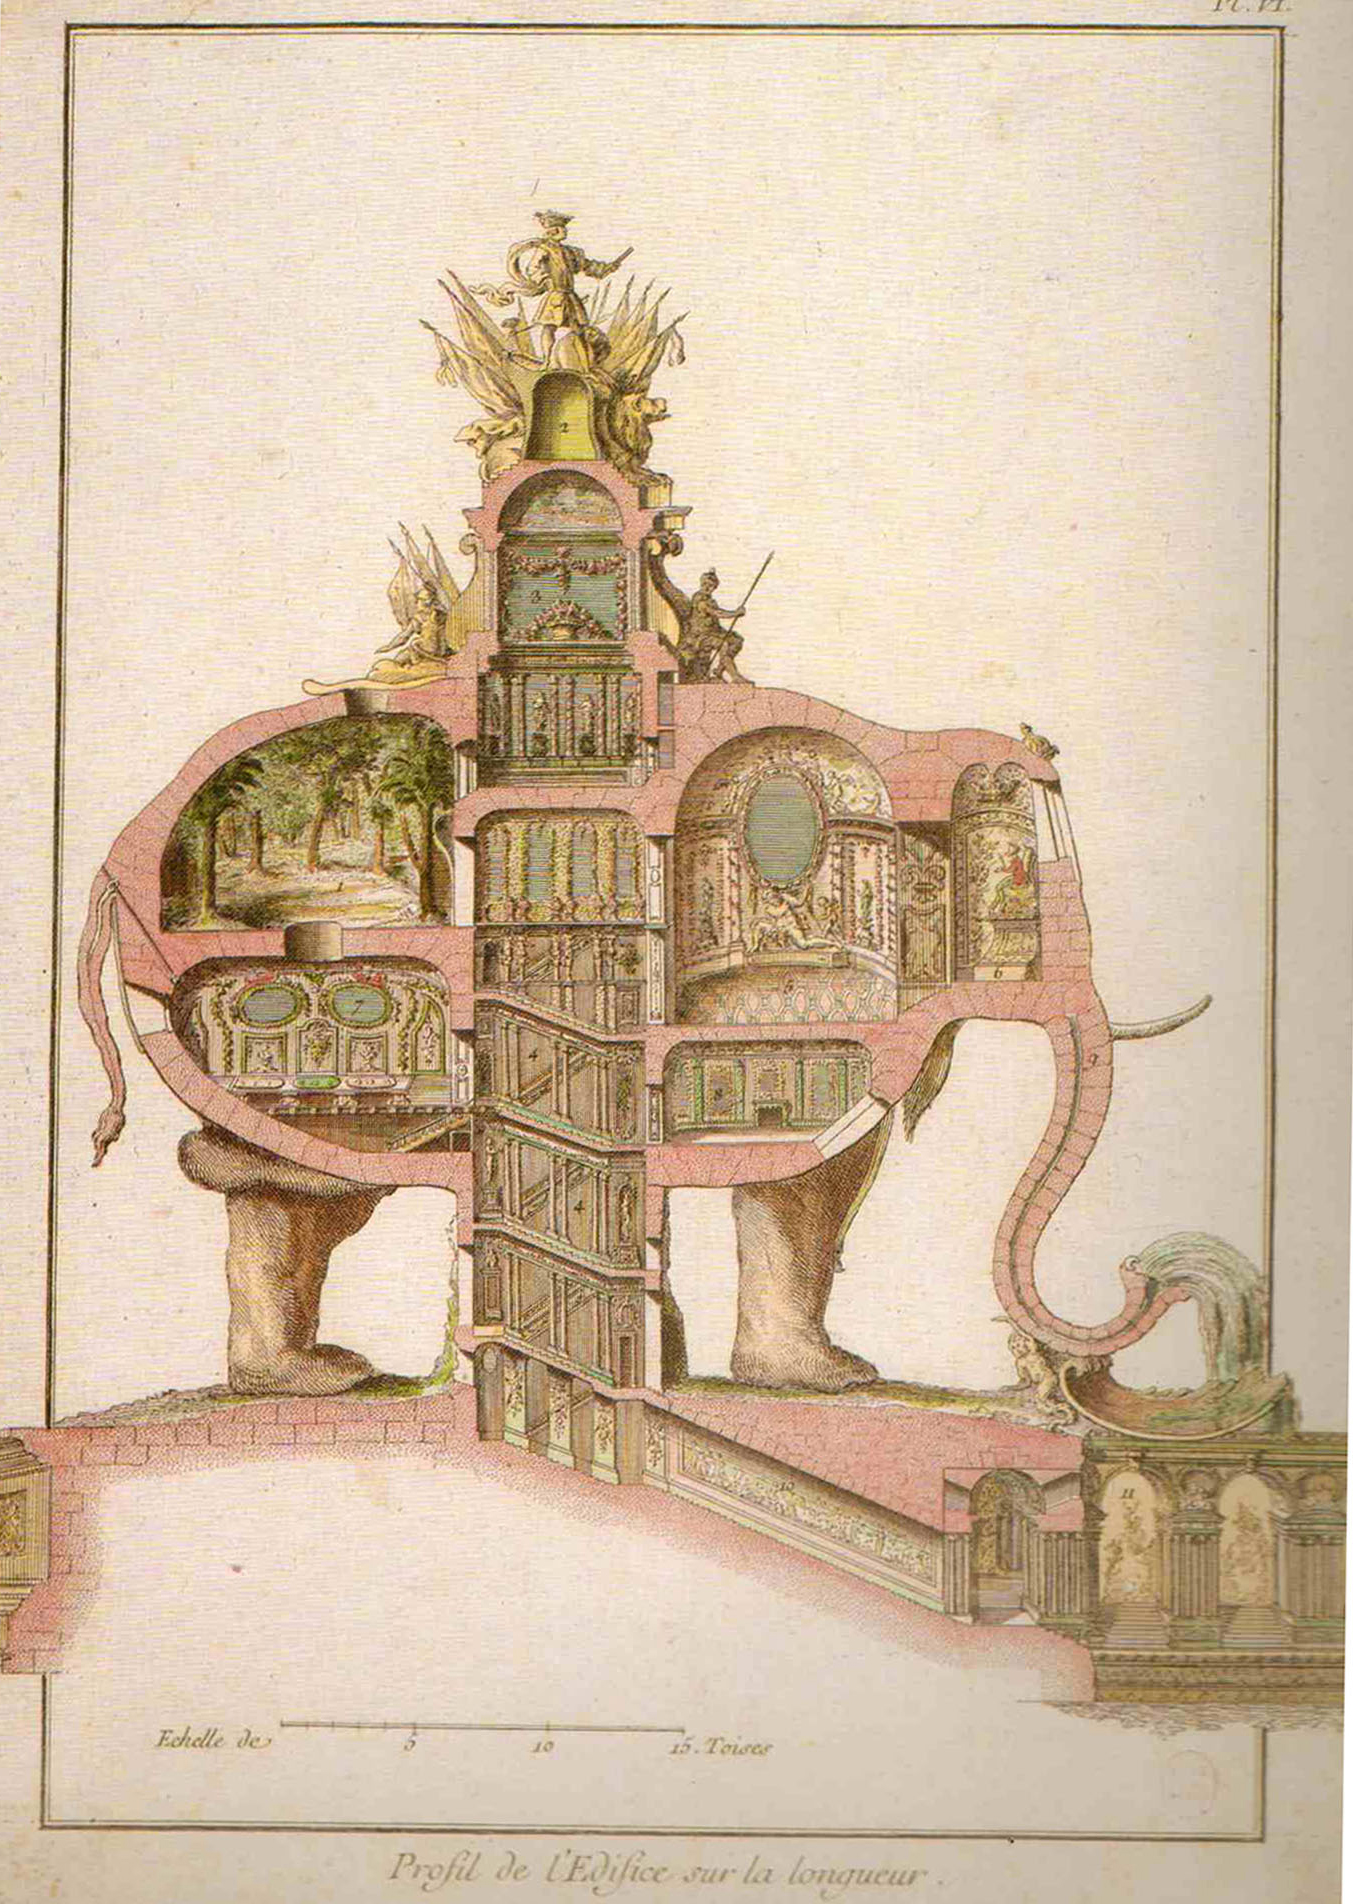 Pruned elefantasia for Elephant design hotel 4